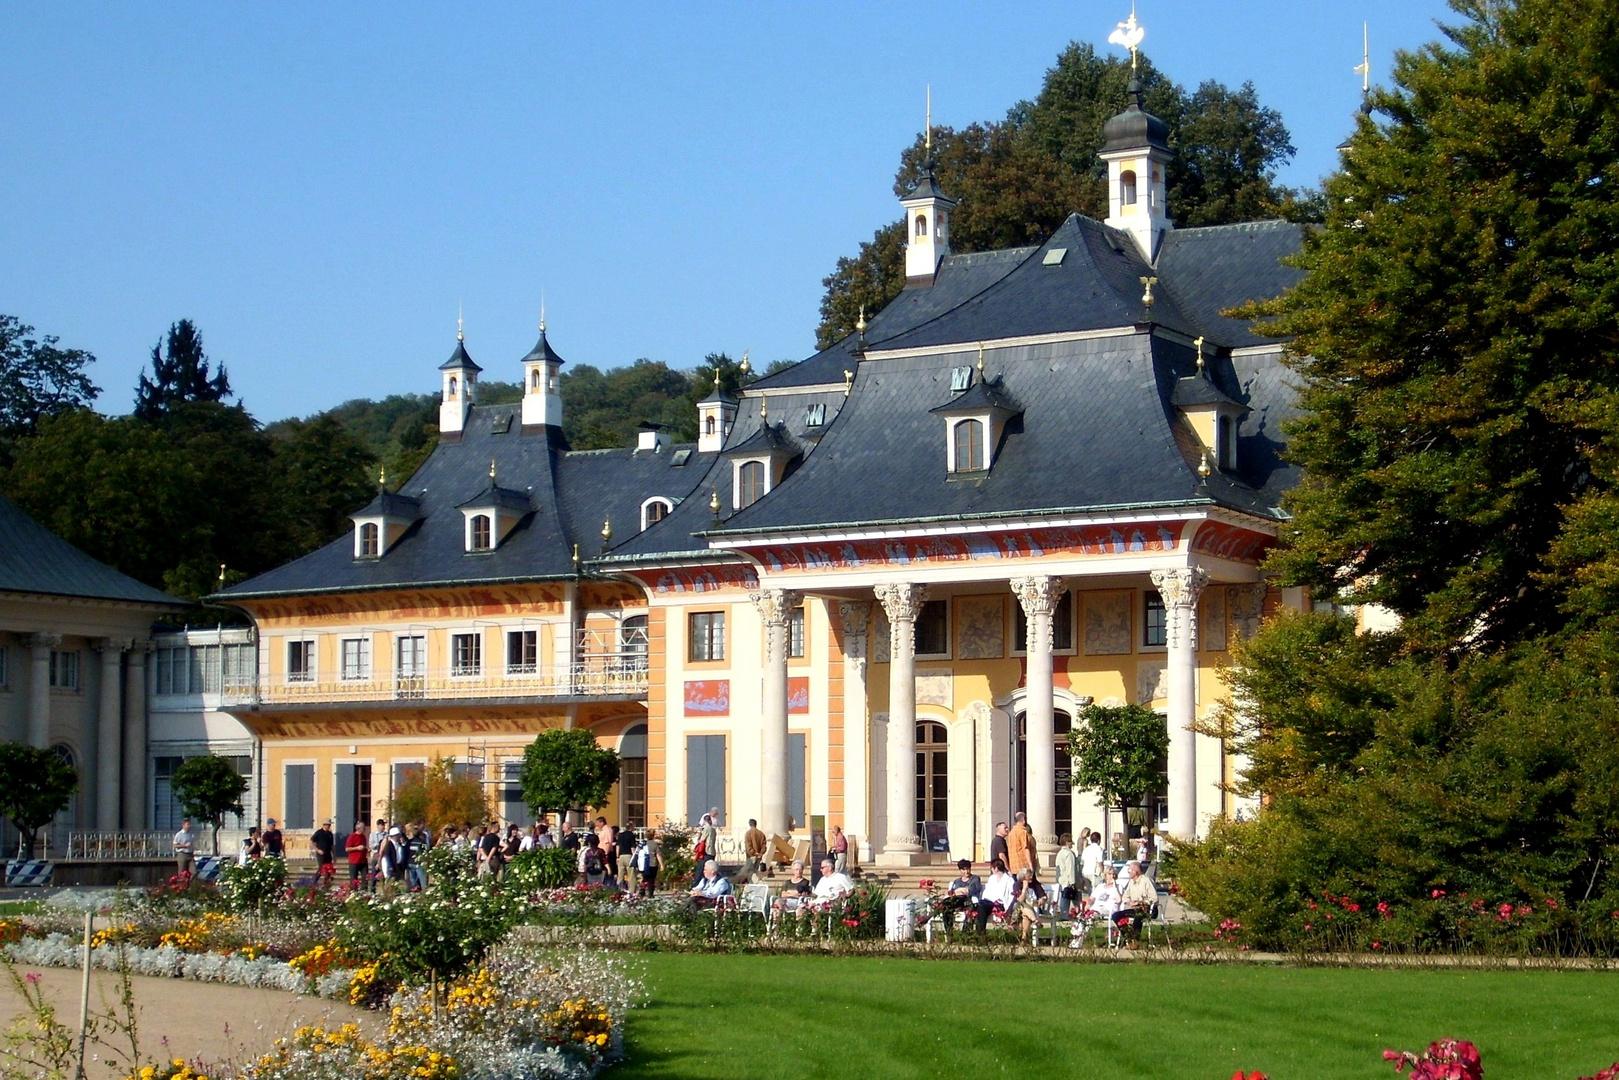 Schloss Pillnitz an einem schönen Sommertag